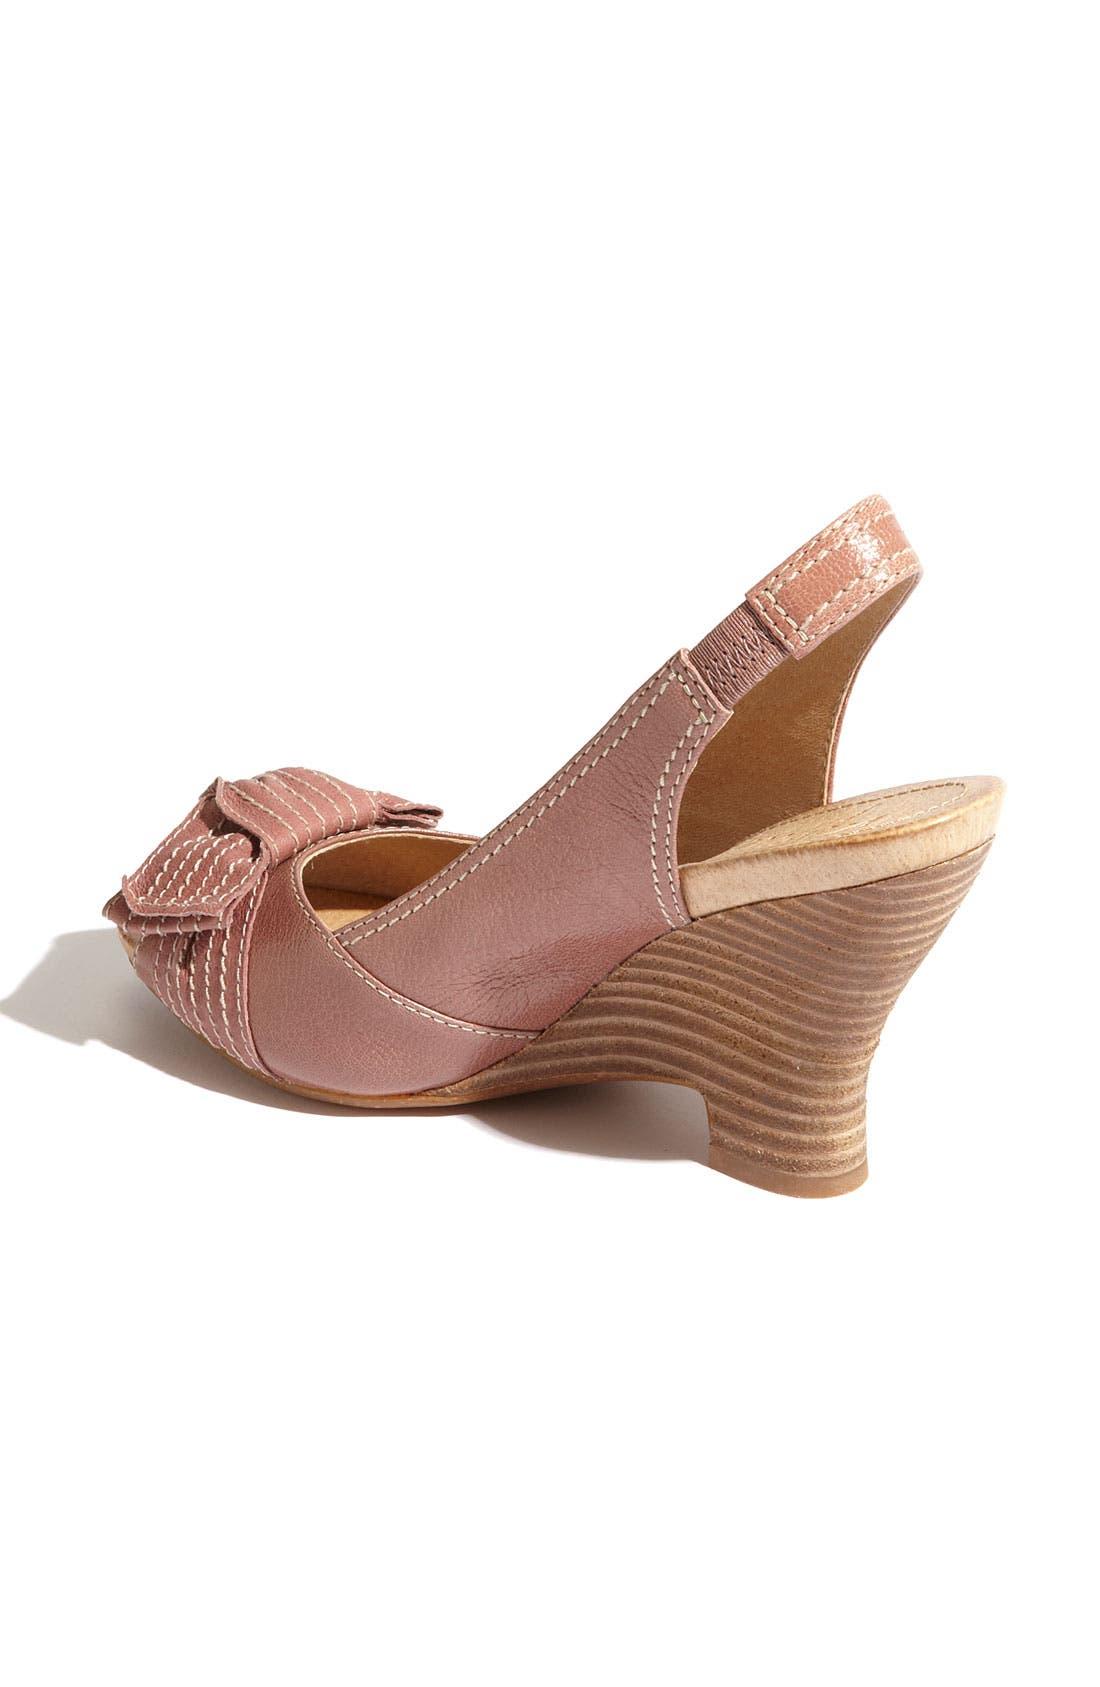 Alternate Image 2  - Naya 'Giada' Sandal